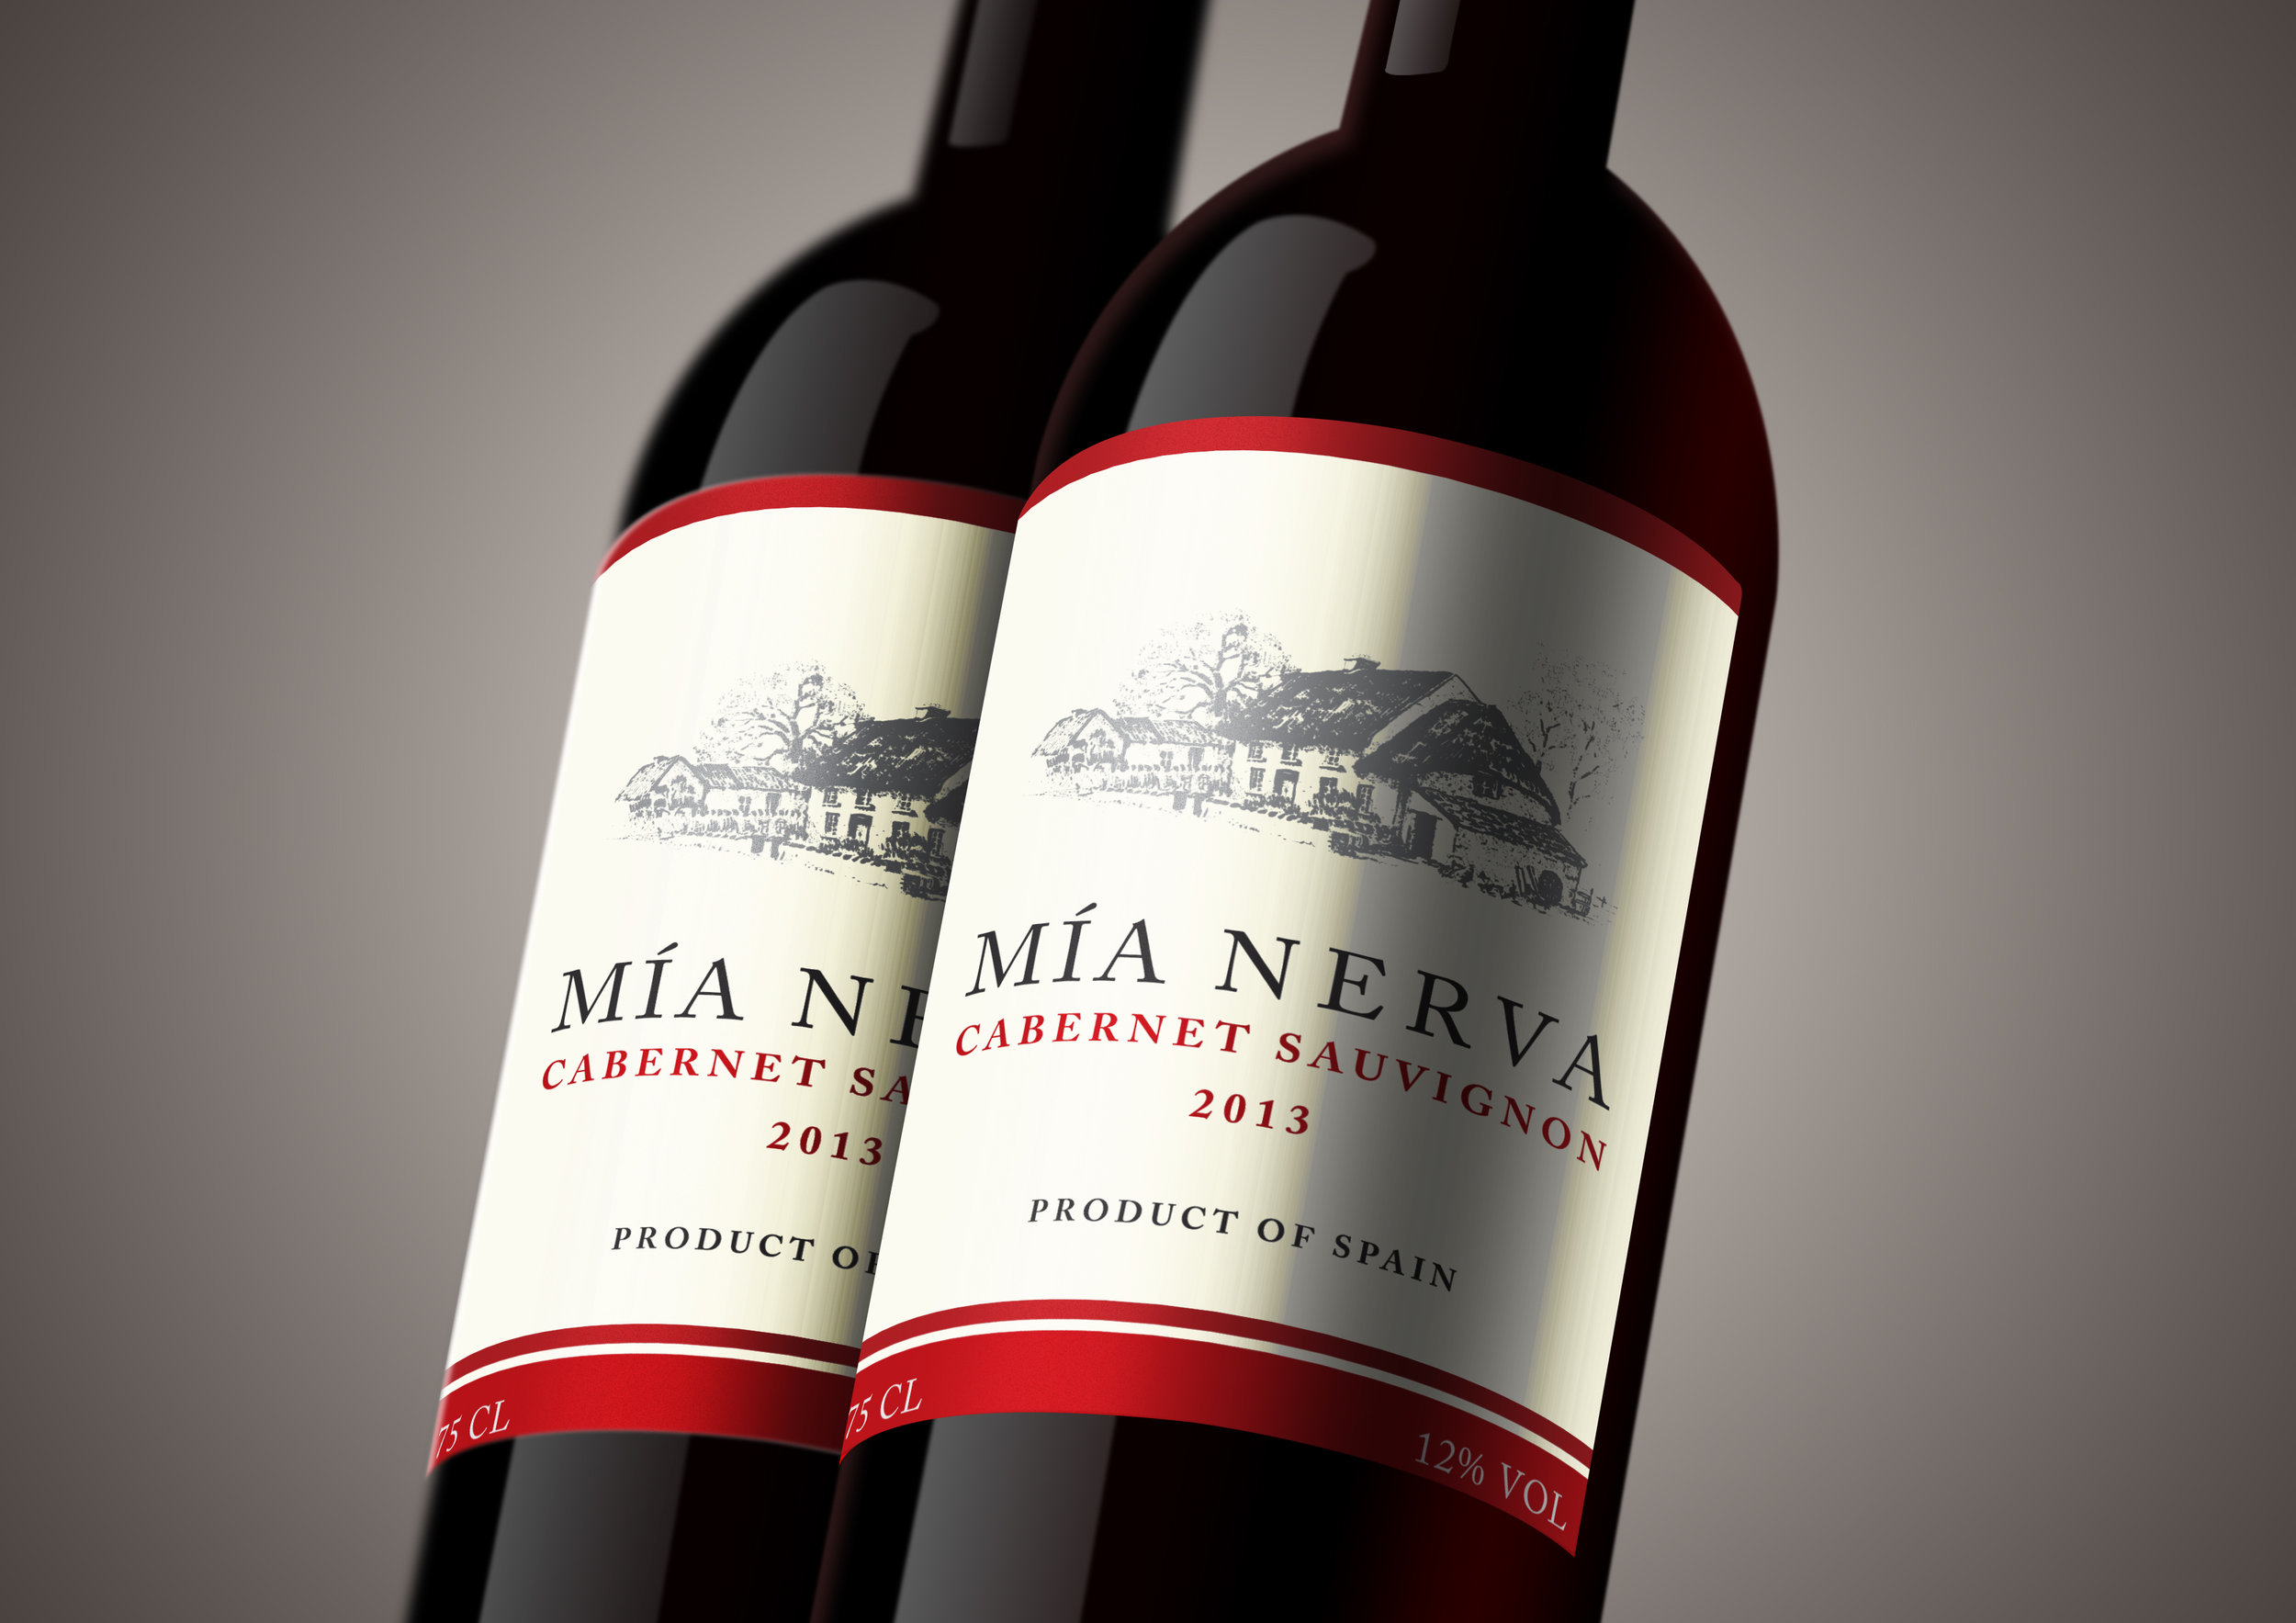 Mia Nerva 2 bottle shot.jpg